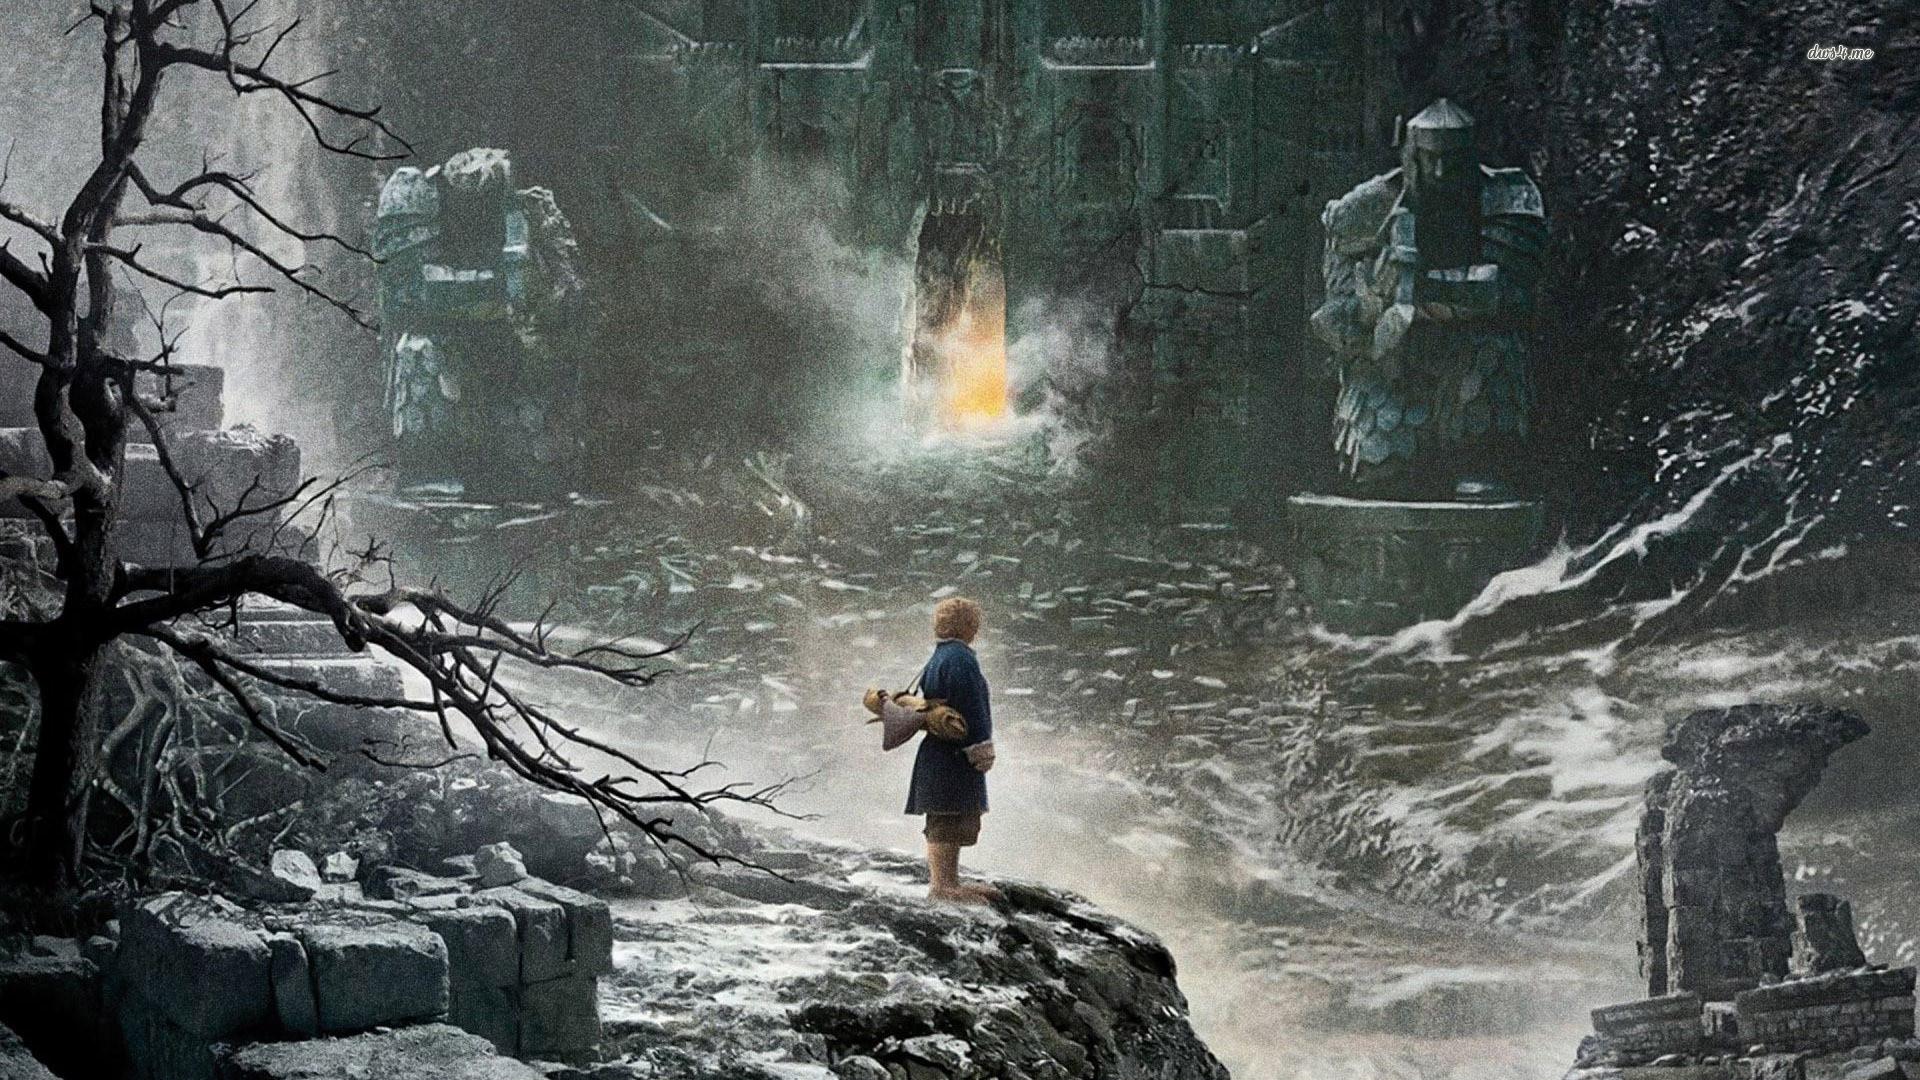 The Hobbit Wallpaper 1920x1080 (84+ images)